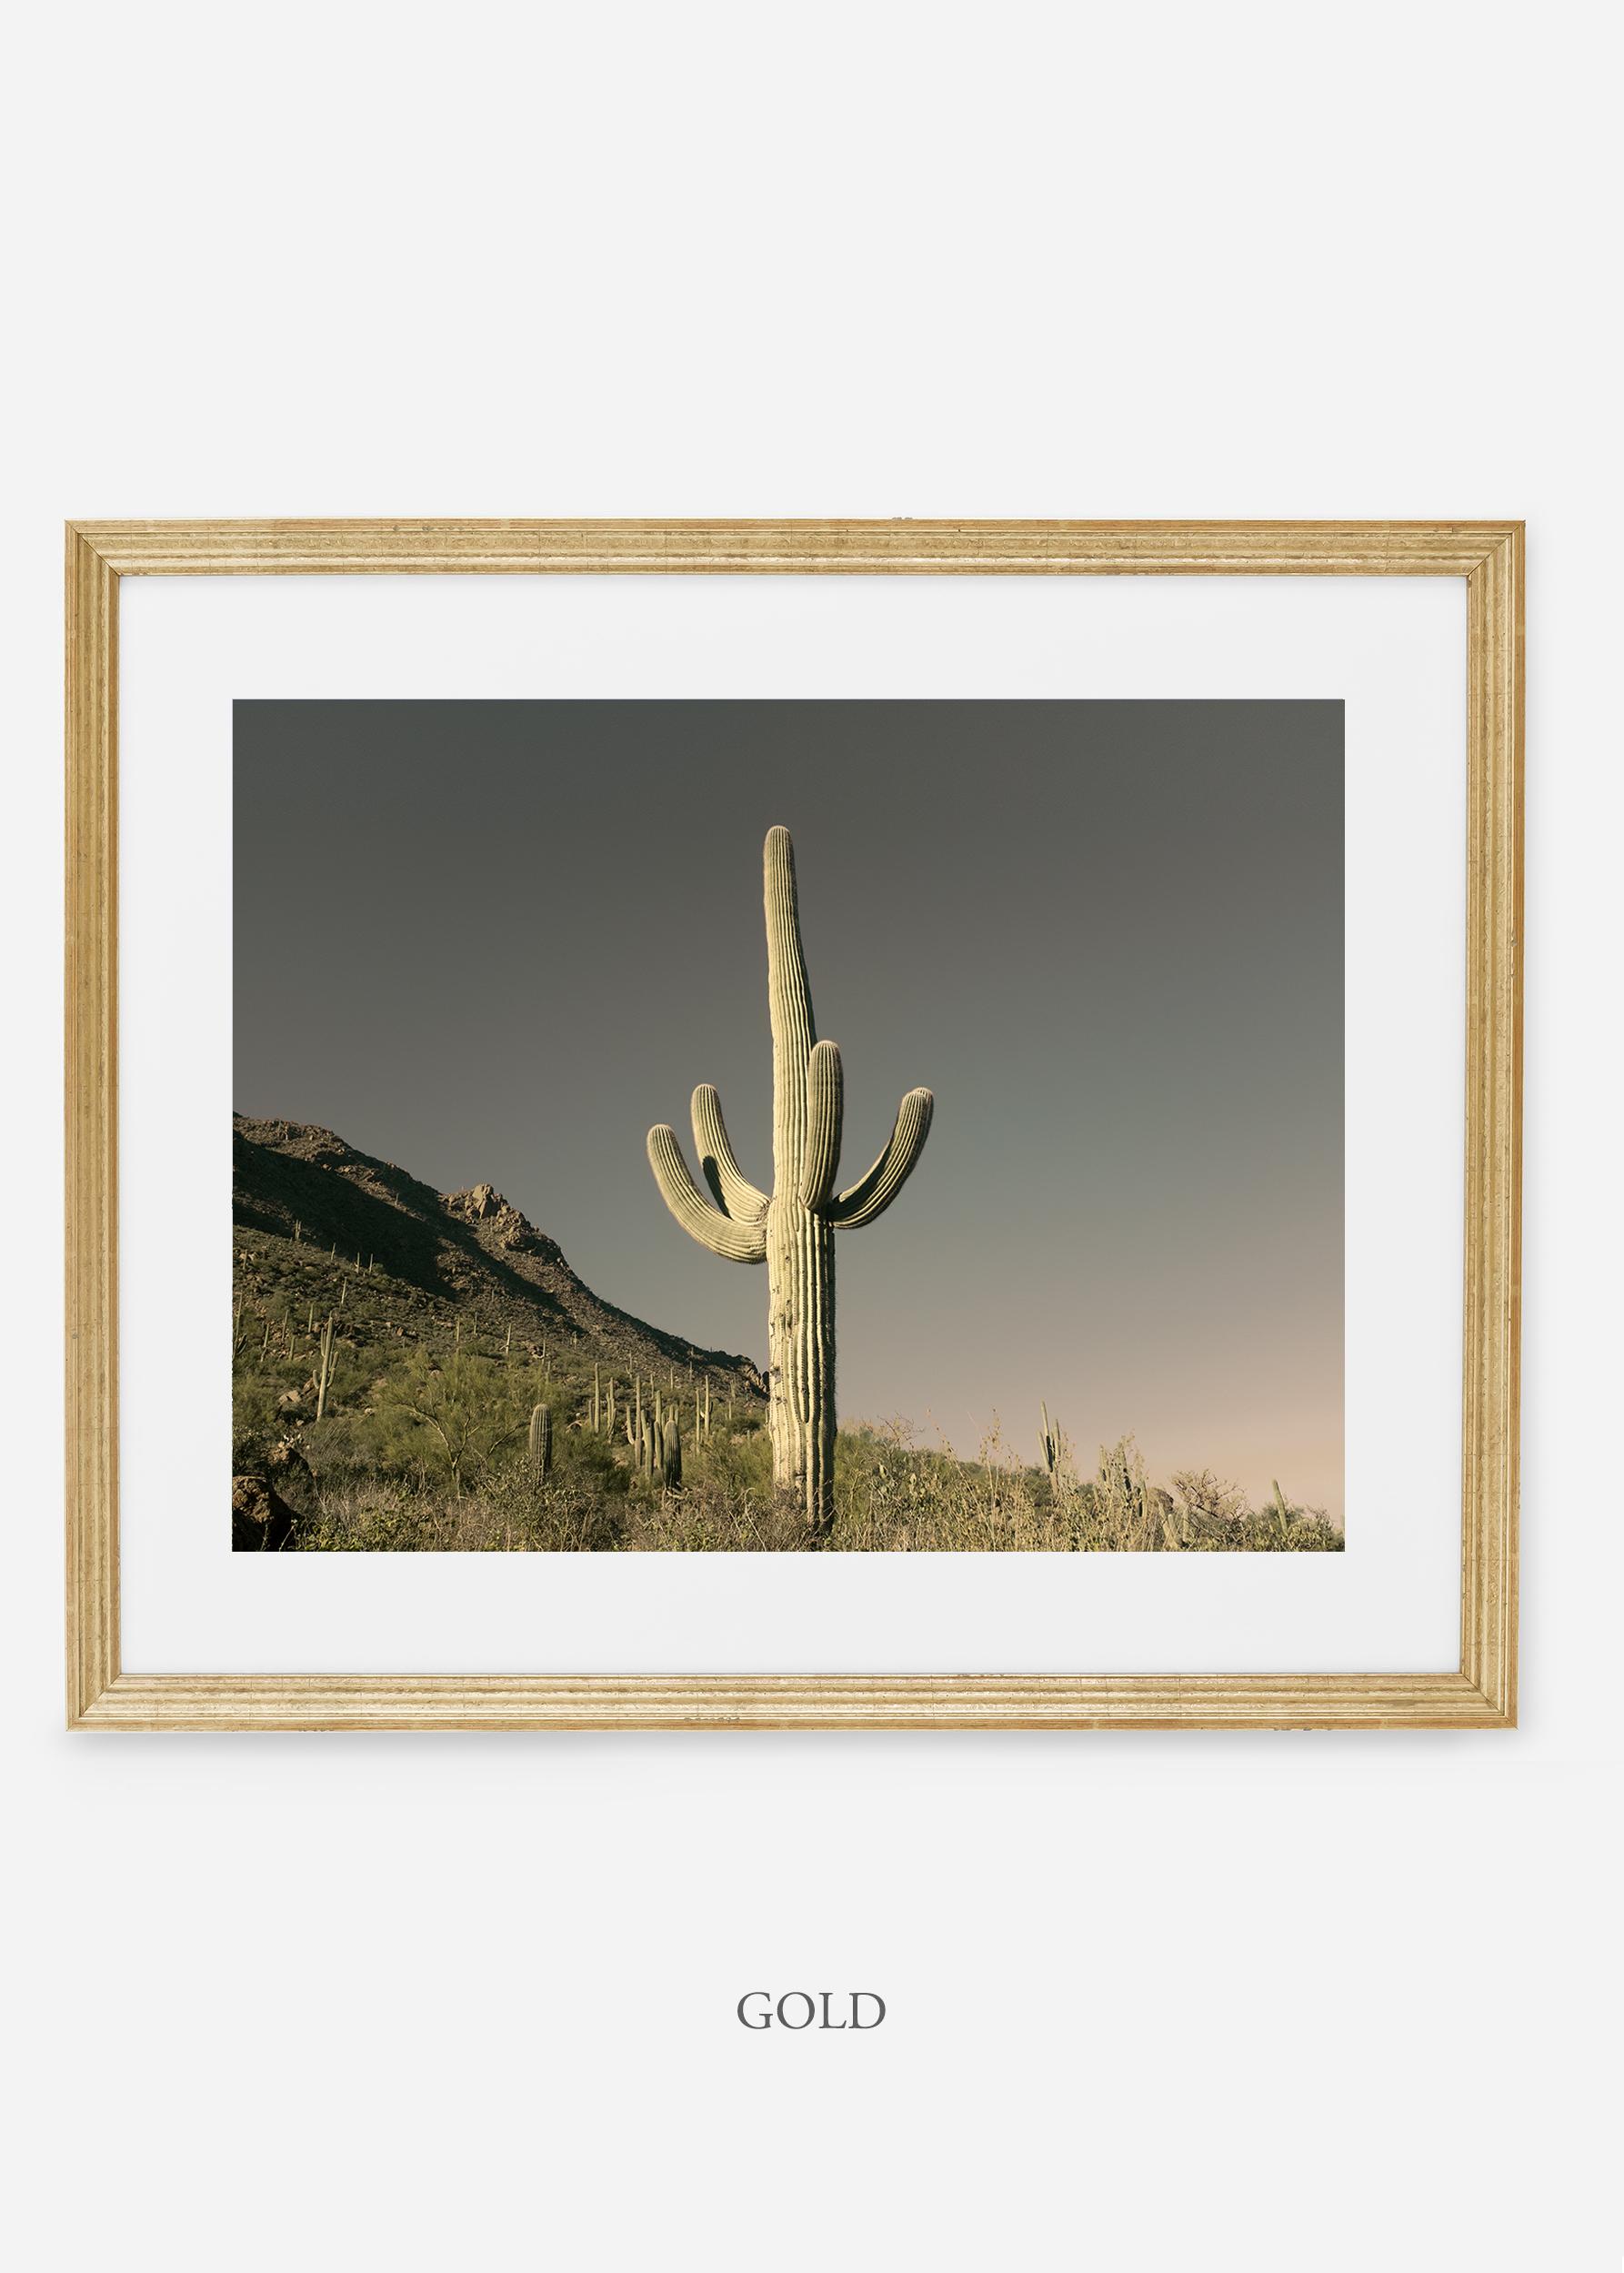 goldframe-saguaroNo.19-wildercalifornia-art-wallart-cactusprint-homedecor-prints-arizona-botanical-artwork-interiordesign.jpg